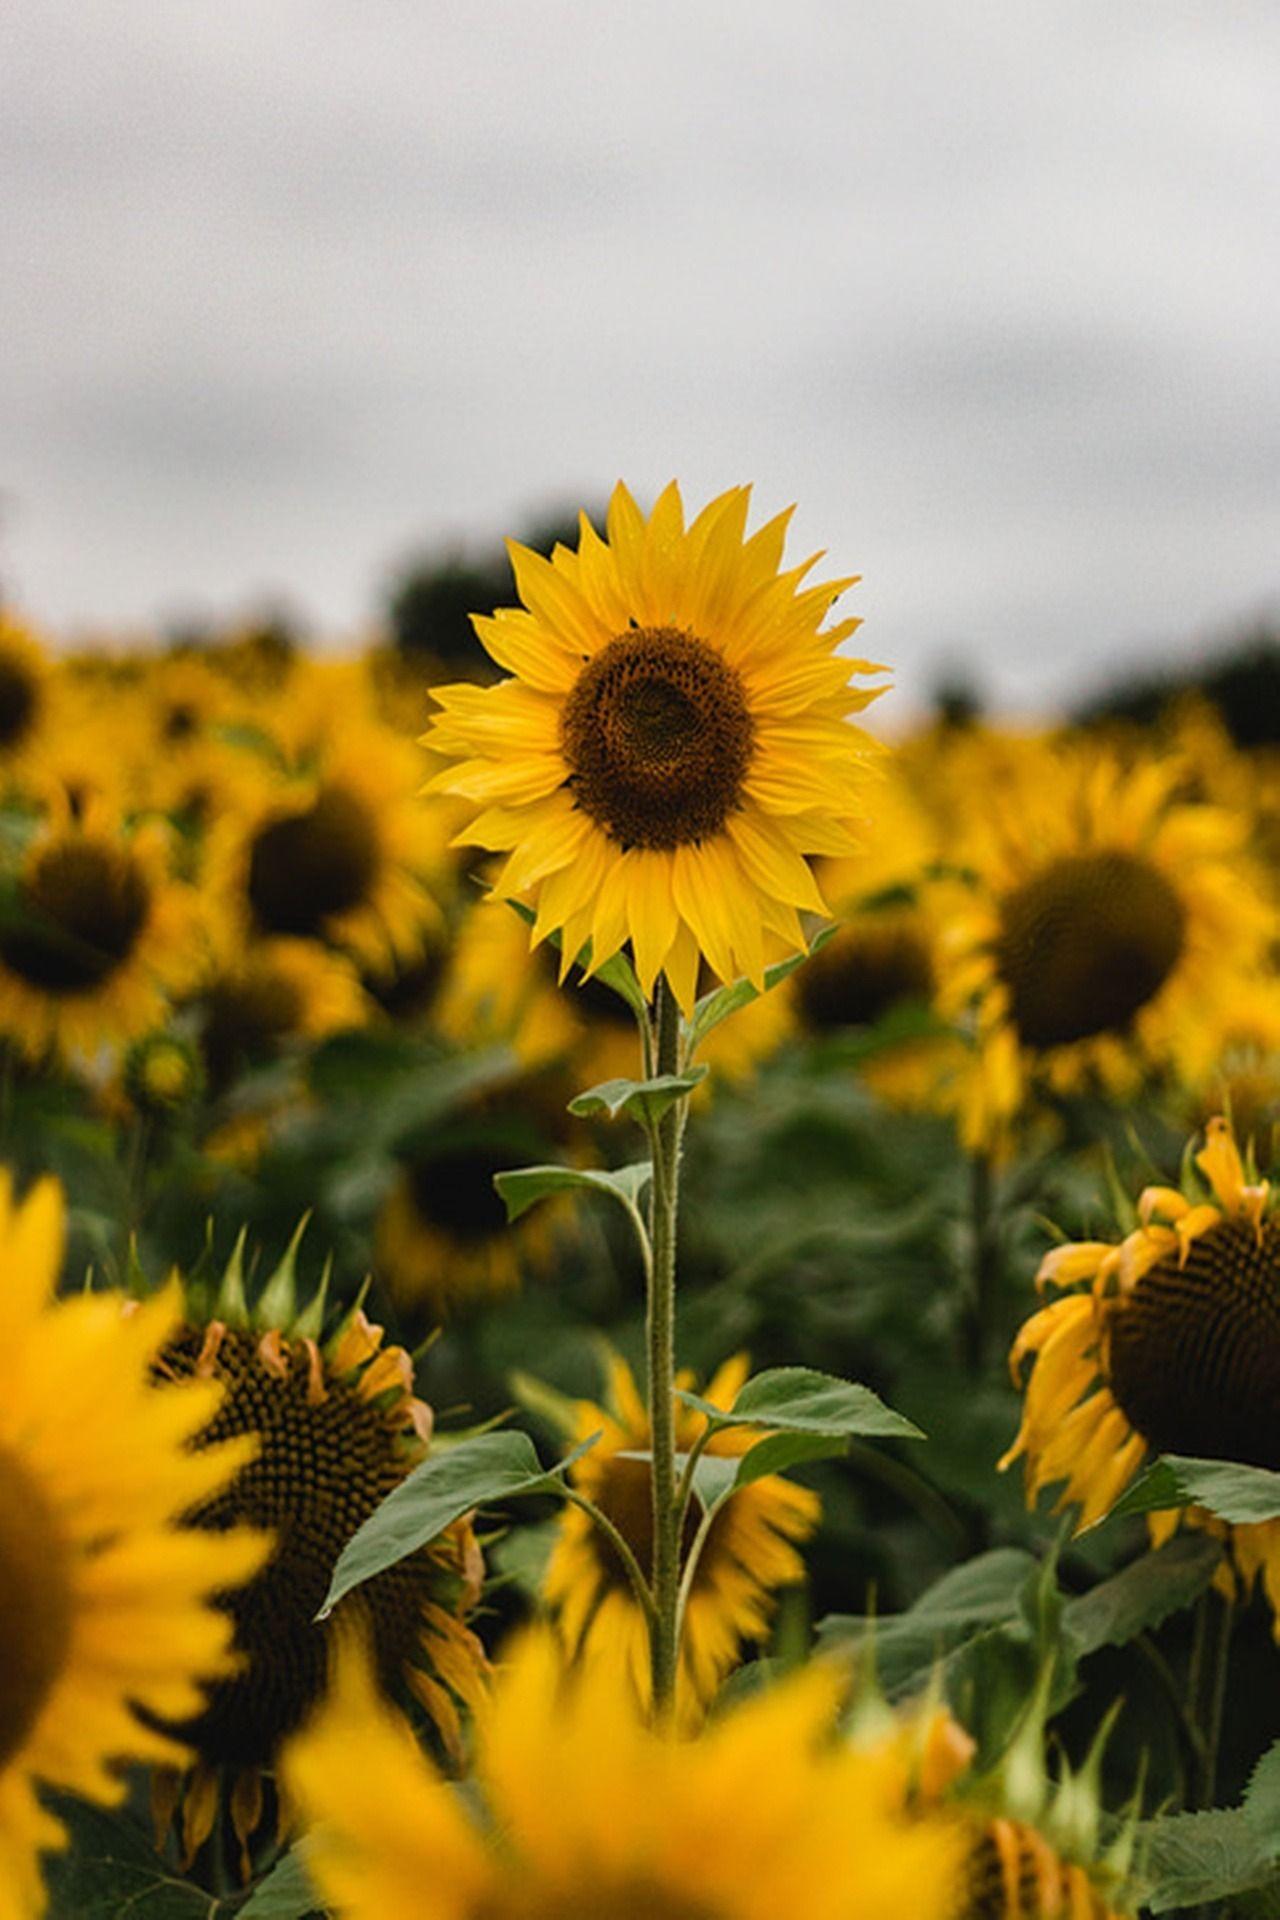 Pin by Betty Nerren on ***The HAPPY FLOWER*** | Sunflower ...